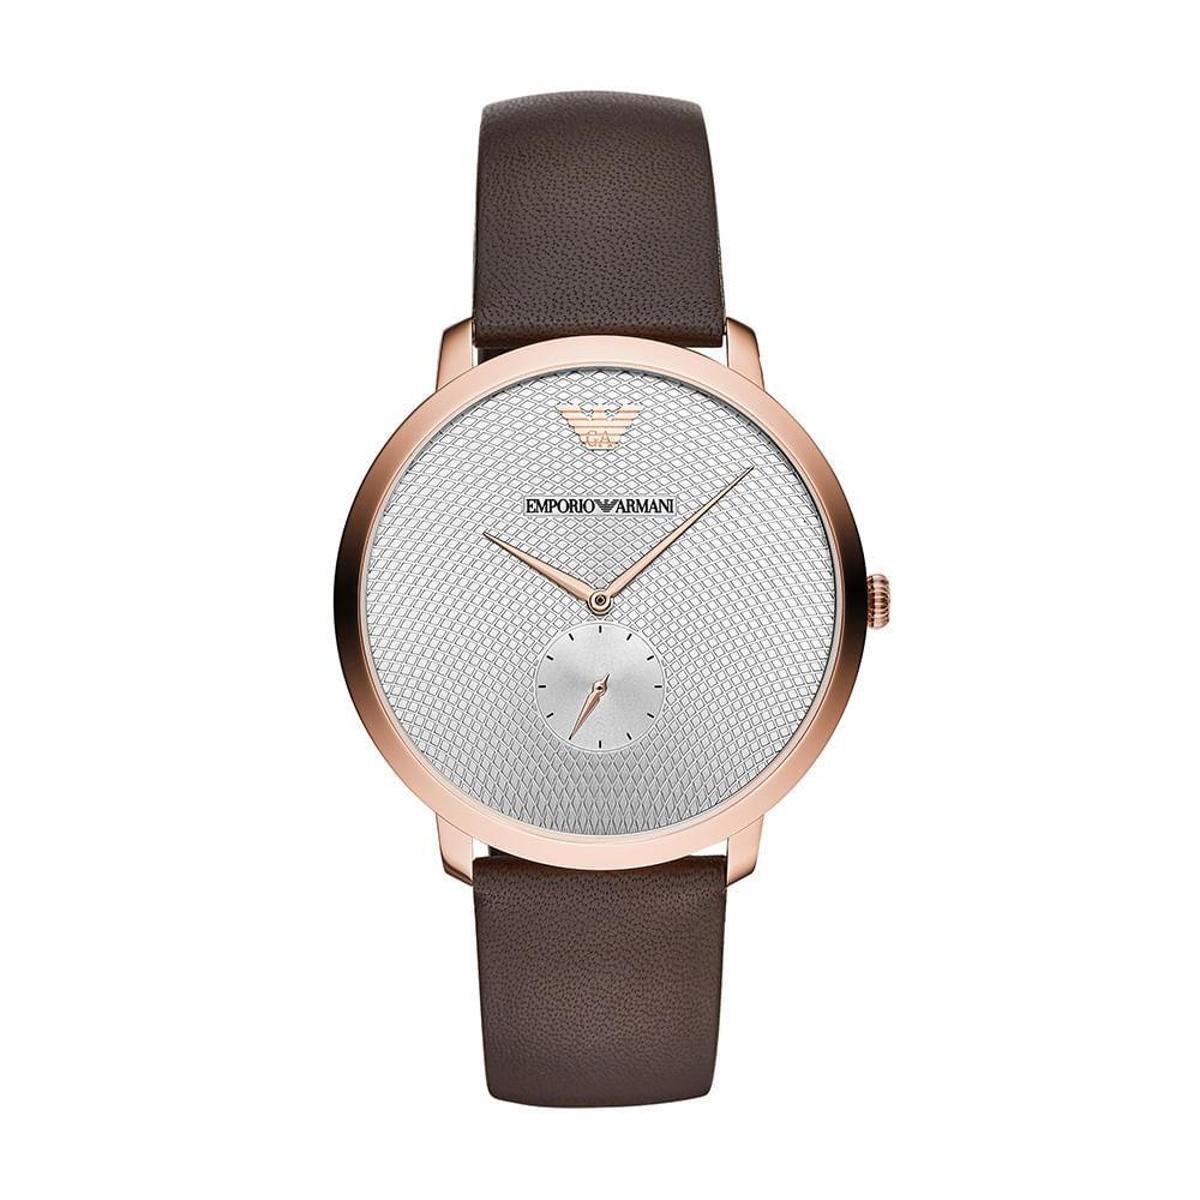 3cc059a0b Relógio Empório Armani Modern Slim Masculino - Preto - Compre Agora ...